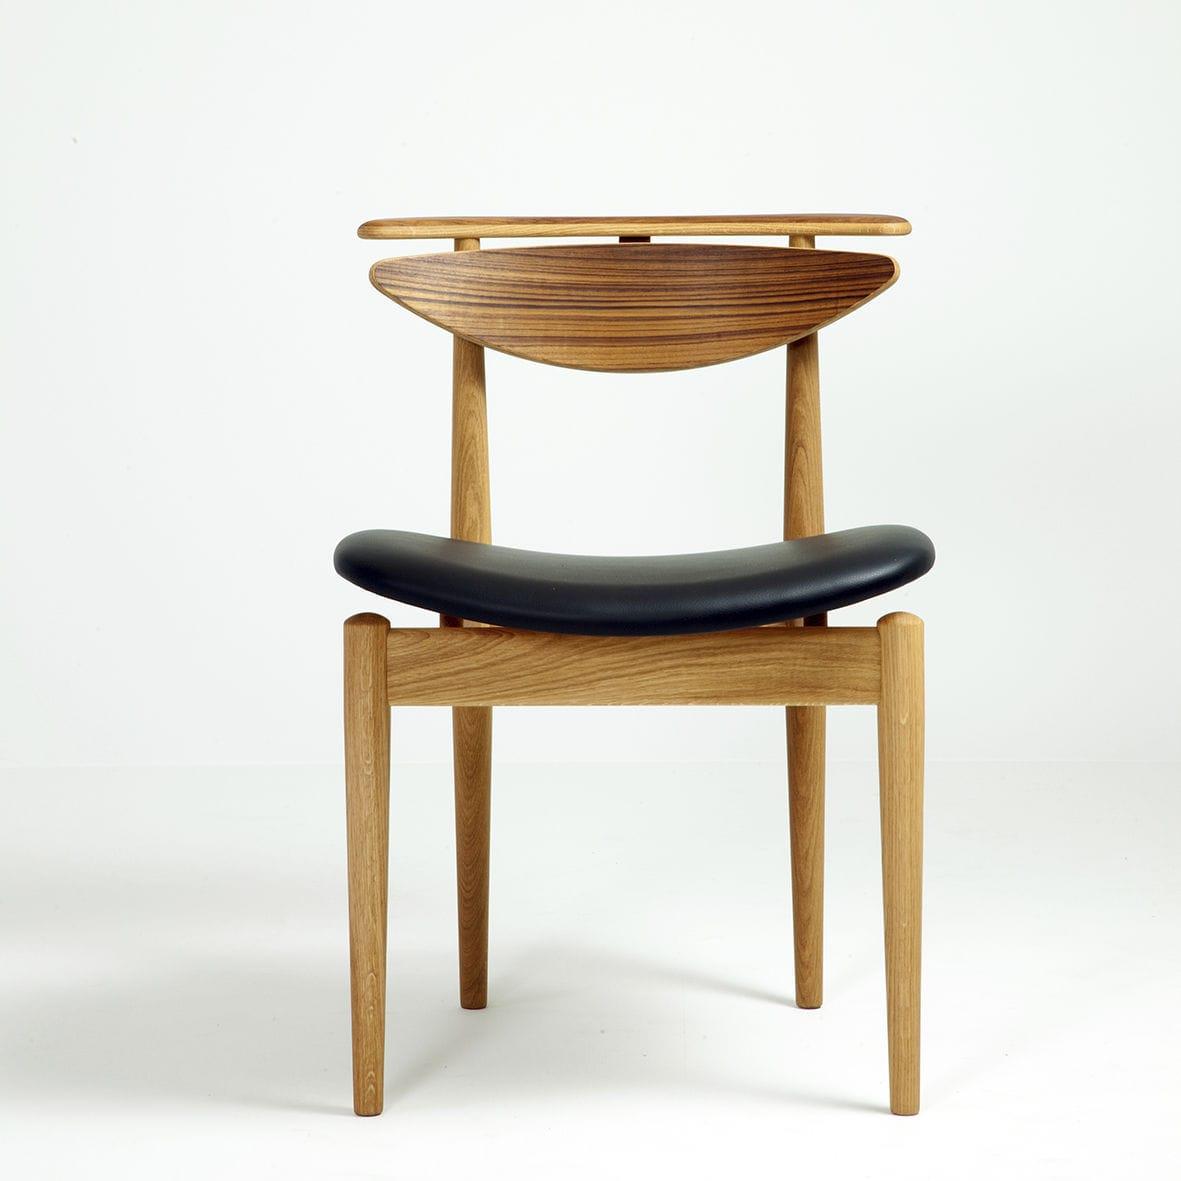 silla de comedor de diseo escandinavo de roble de nogal de tela reading